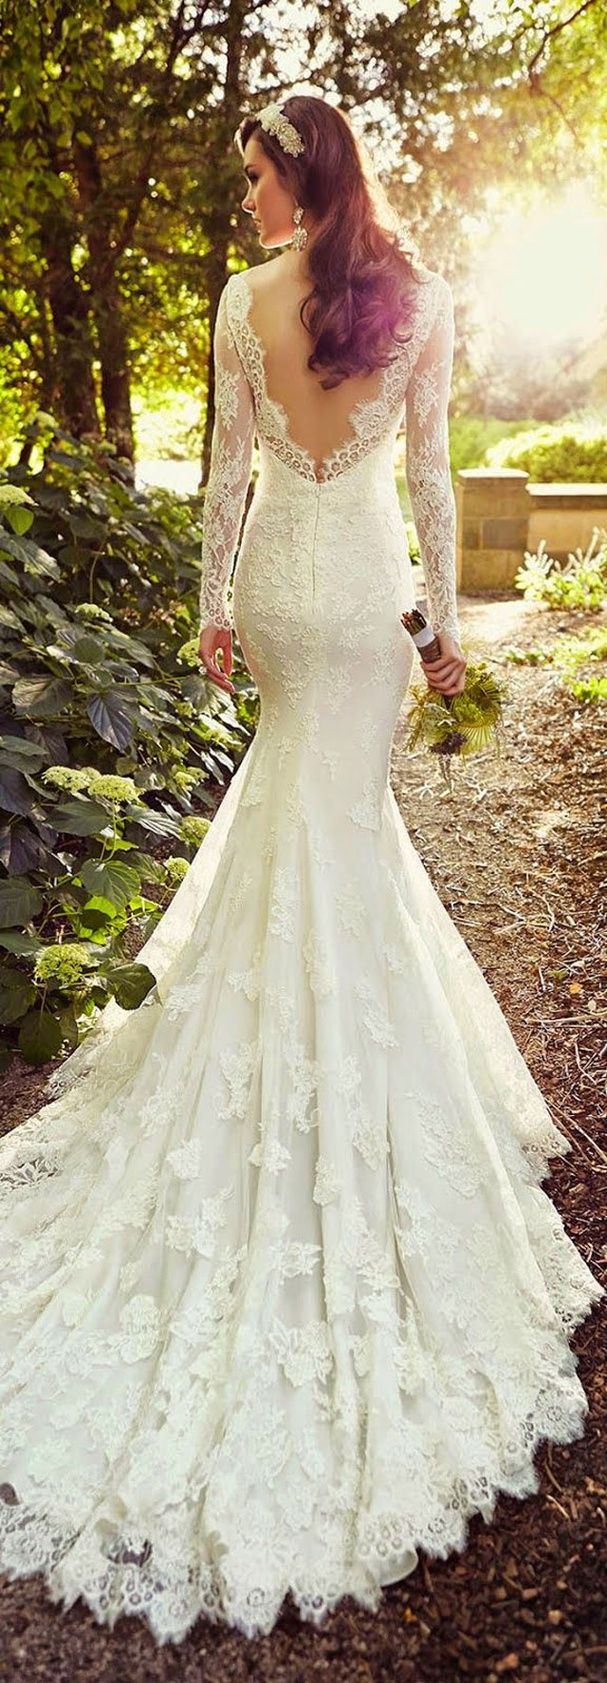 Une robe de mariée sirène